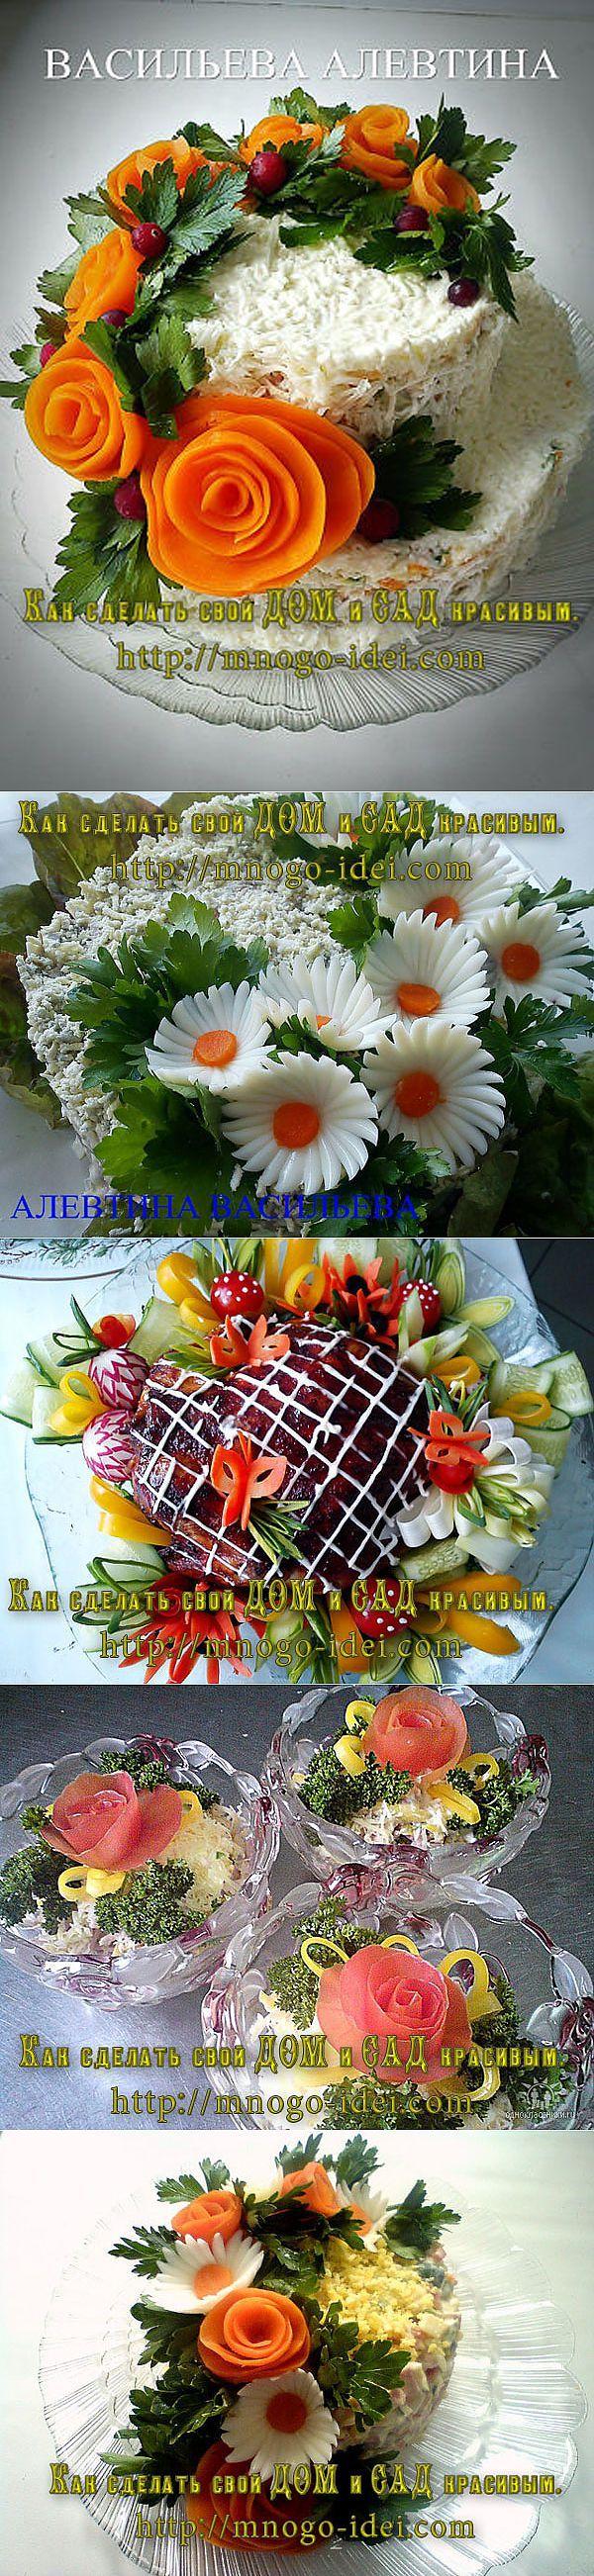 Salades.  Mooi design.  |